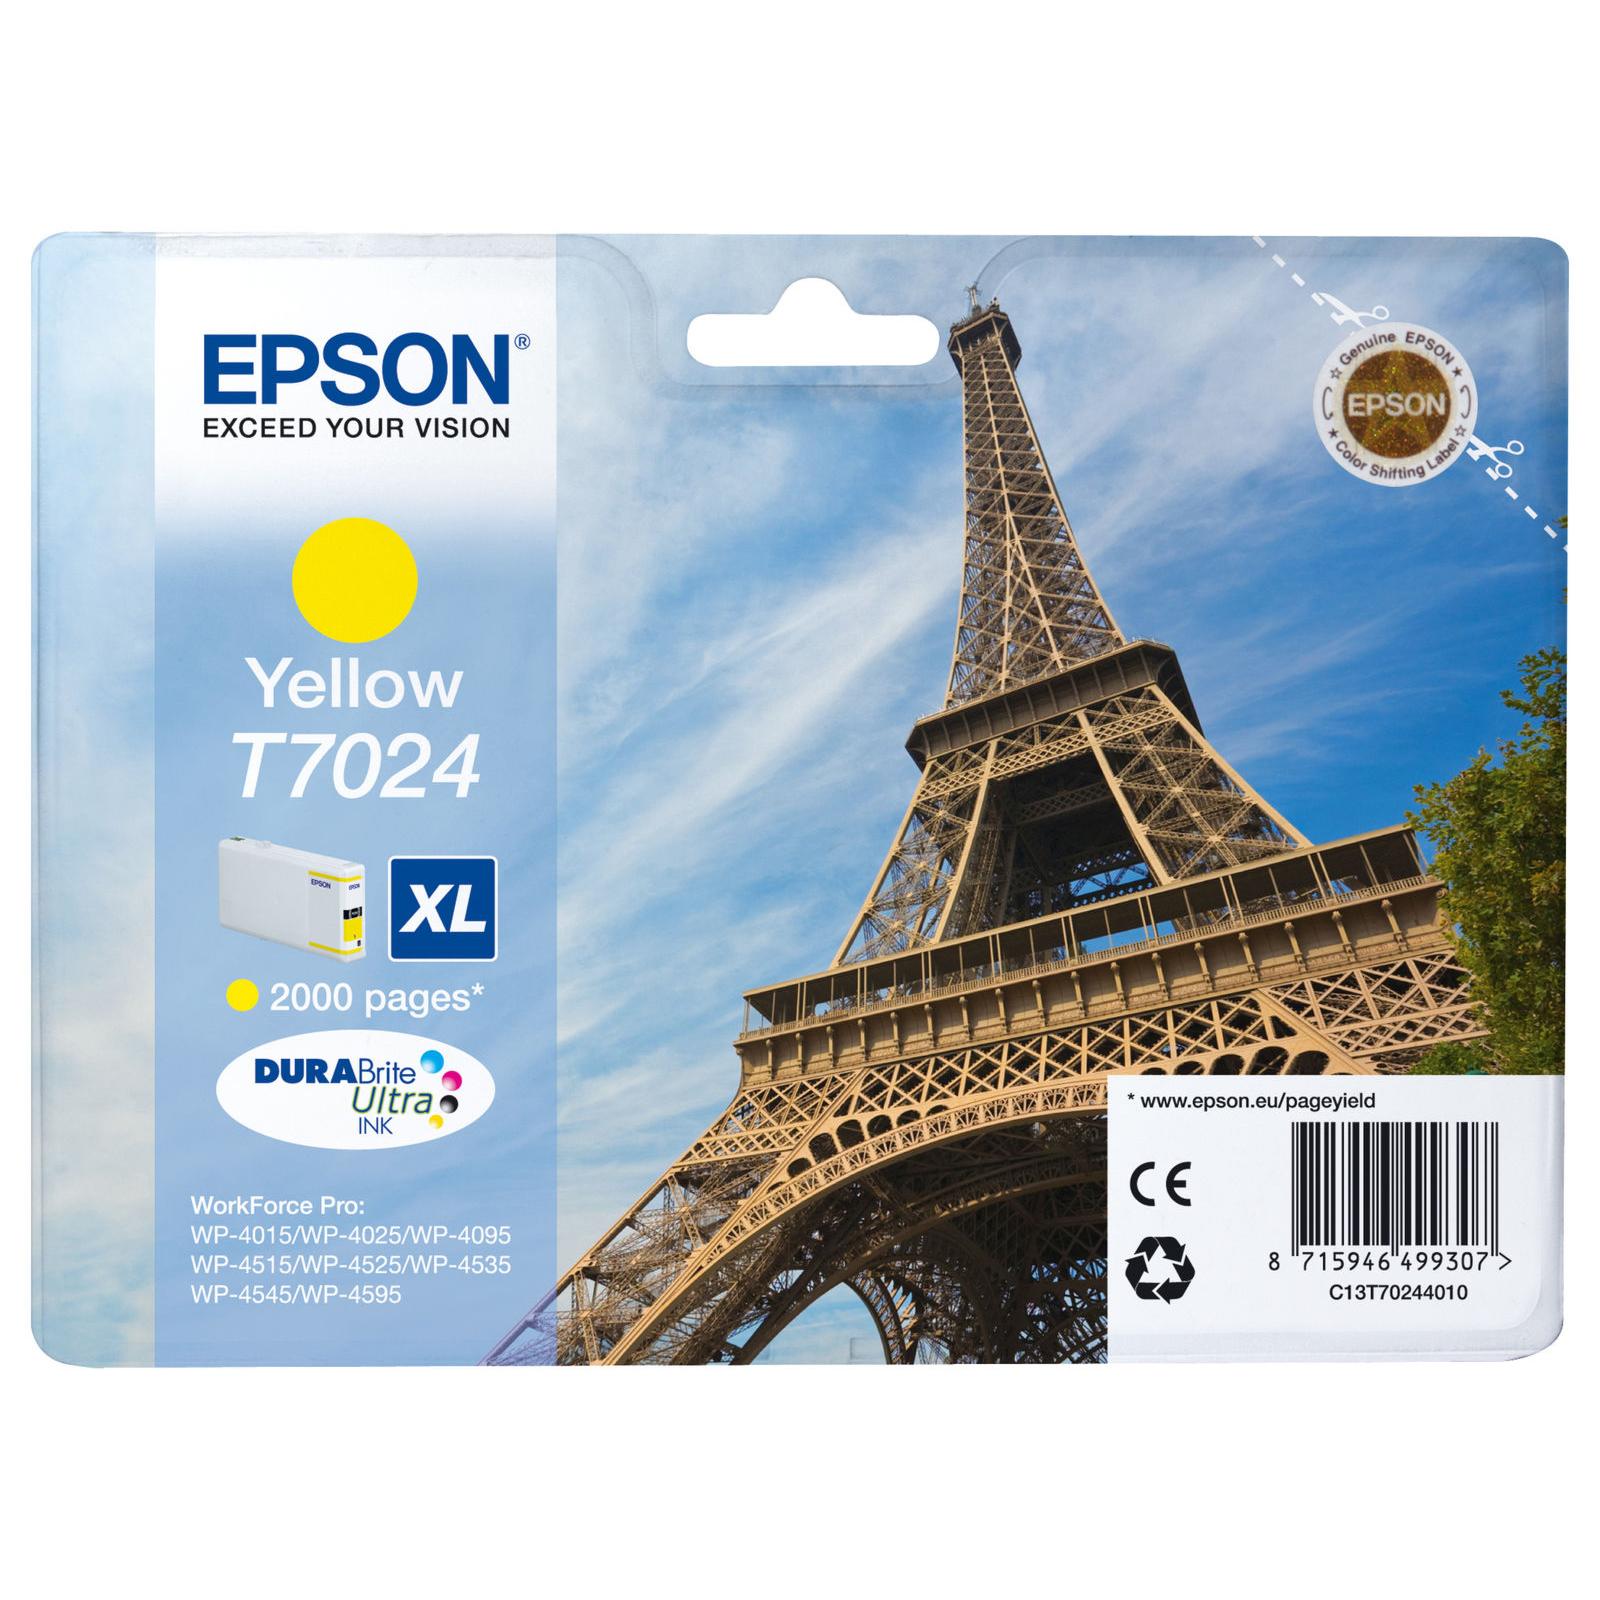 Epson T7024 XL Ink Cartridge - Yellow